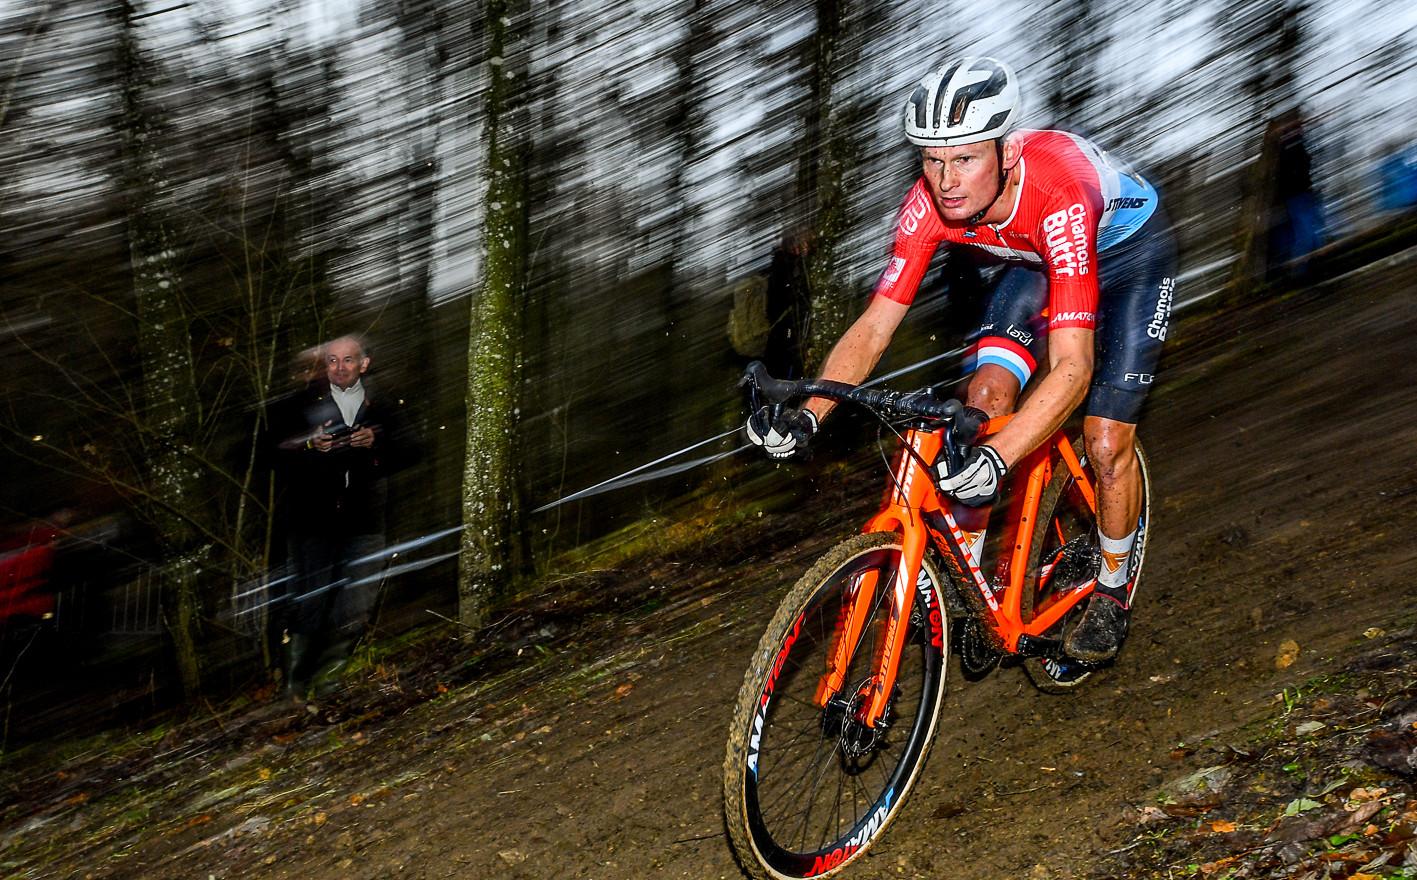 National CX-Champion Soeren Nissen (L) at the Cyclocross-Race in Cessange (L)